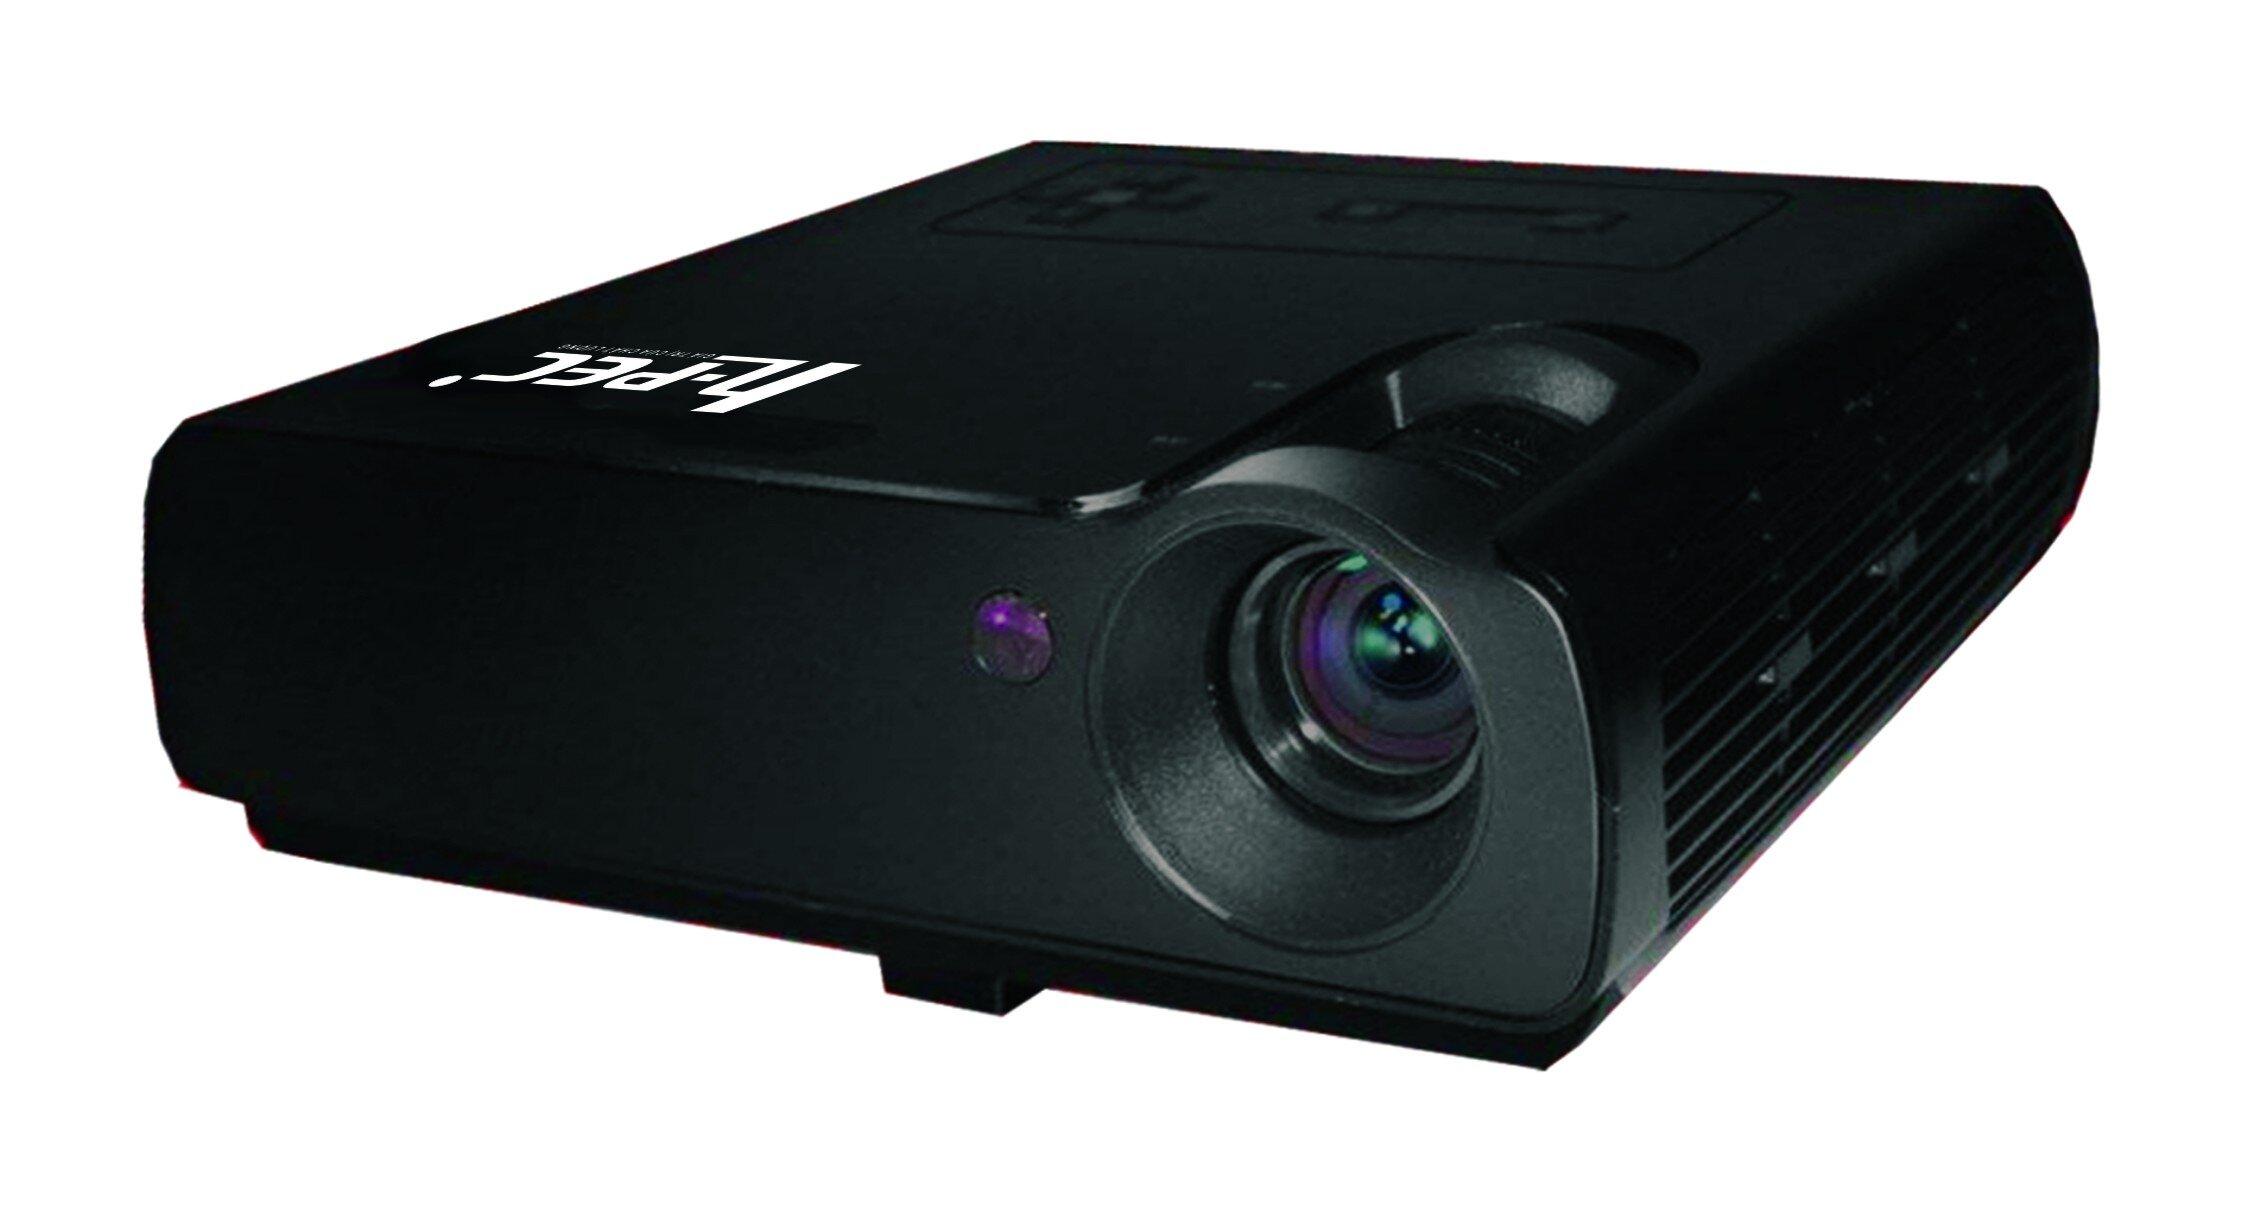 Máy chiếu H-Pec H-2812D - 2800 lumens